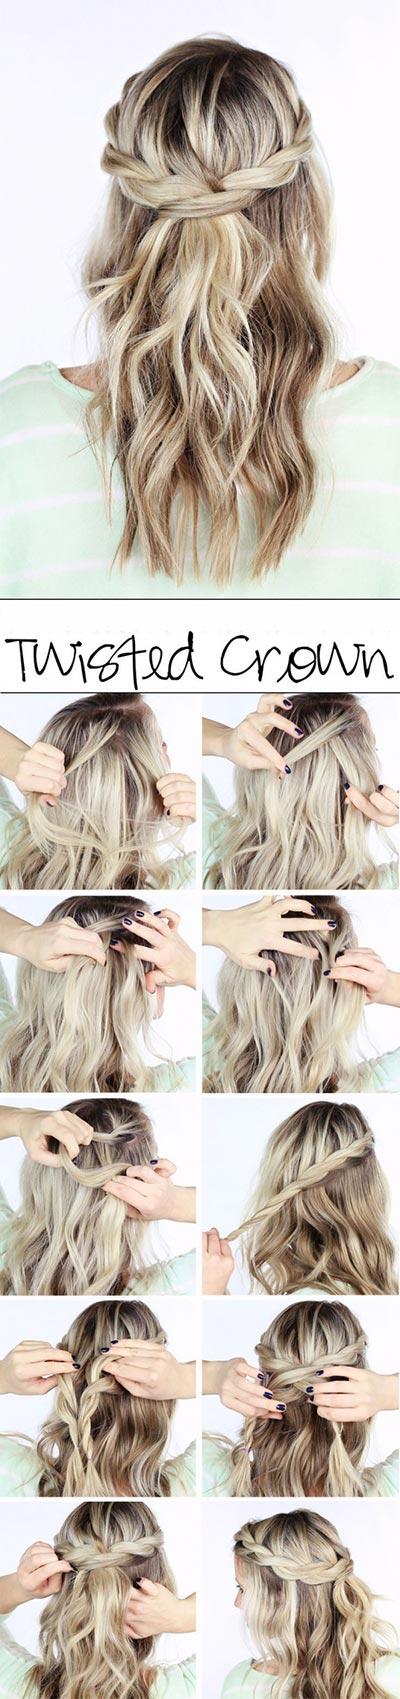 half-up-half-down-hairstyles-26